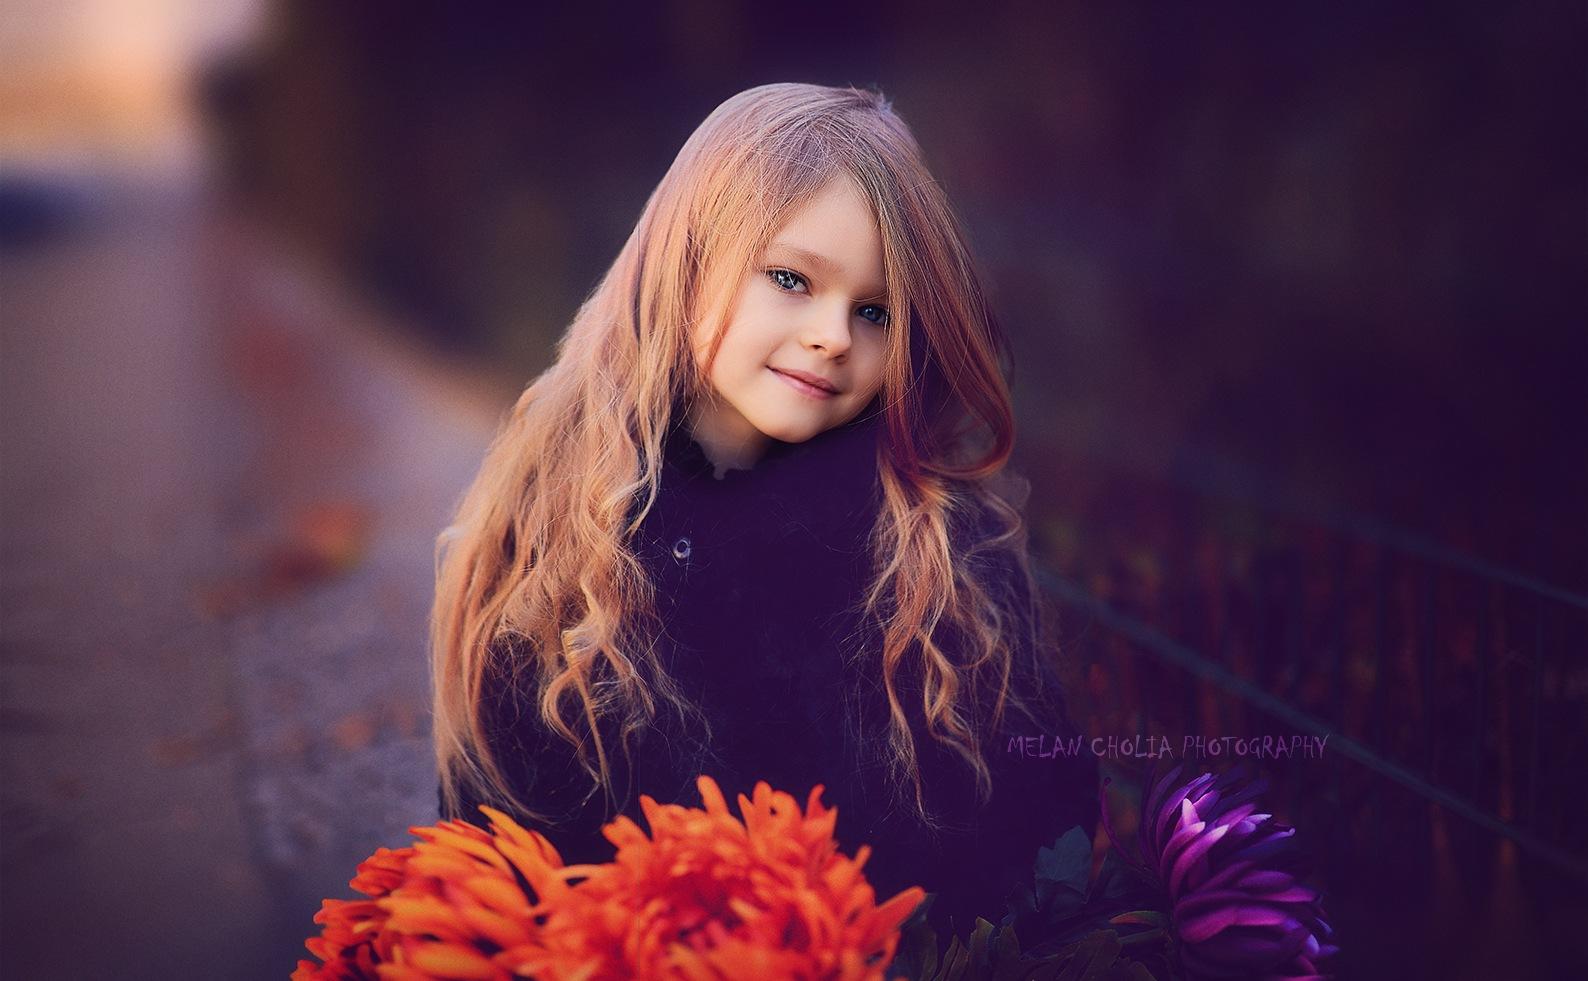 Violettes don't fade away by Melan Cholia